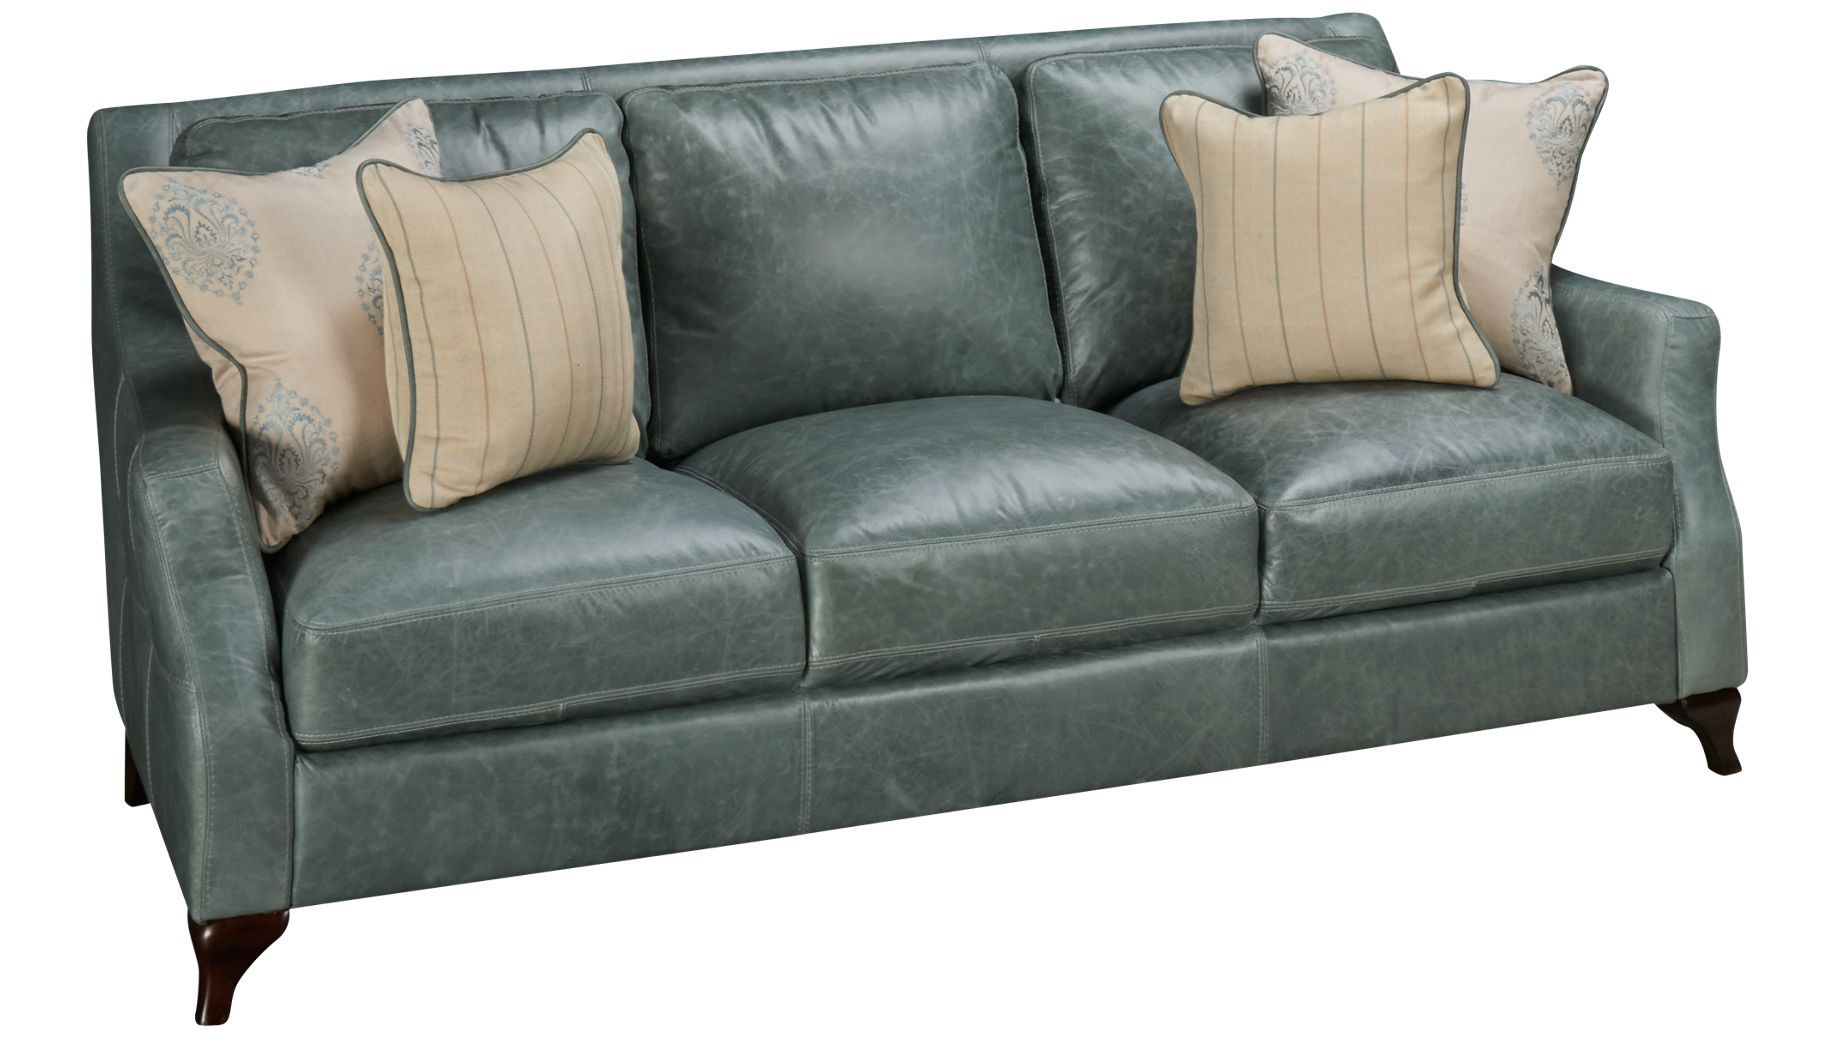 Simon Li Camden Leather Sofa Leather Loveseat Leather Sofa